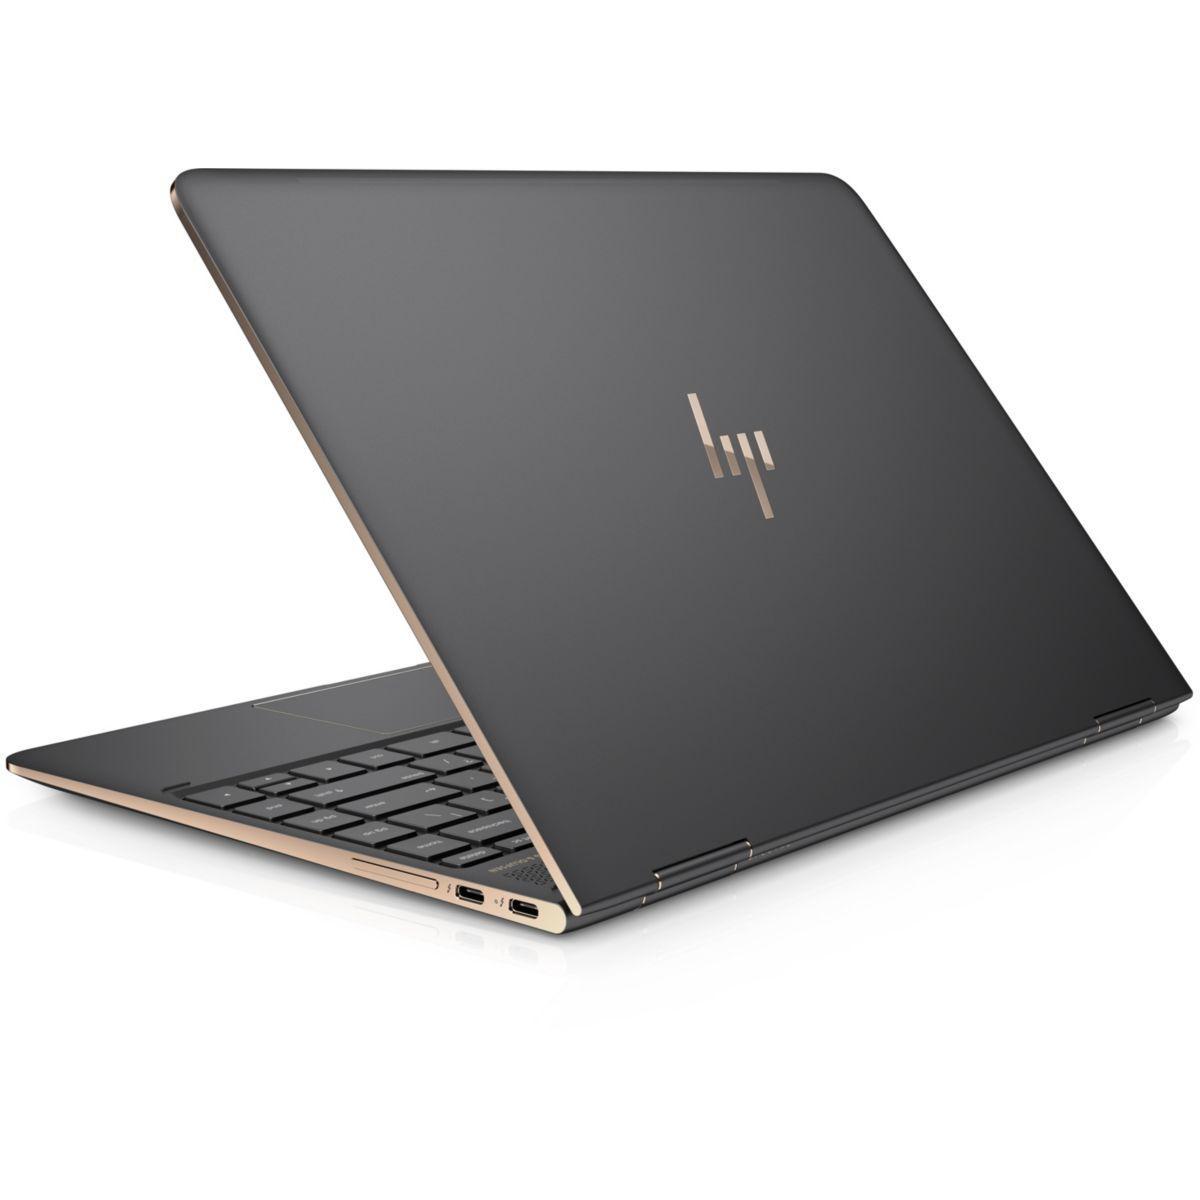 "Hp Spectre X360 13-ac022nf 13"" Core I7-7500U 2.7 GHz  - SSD 256 Go - RAM 8 Go"